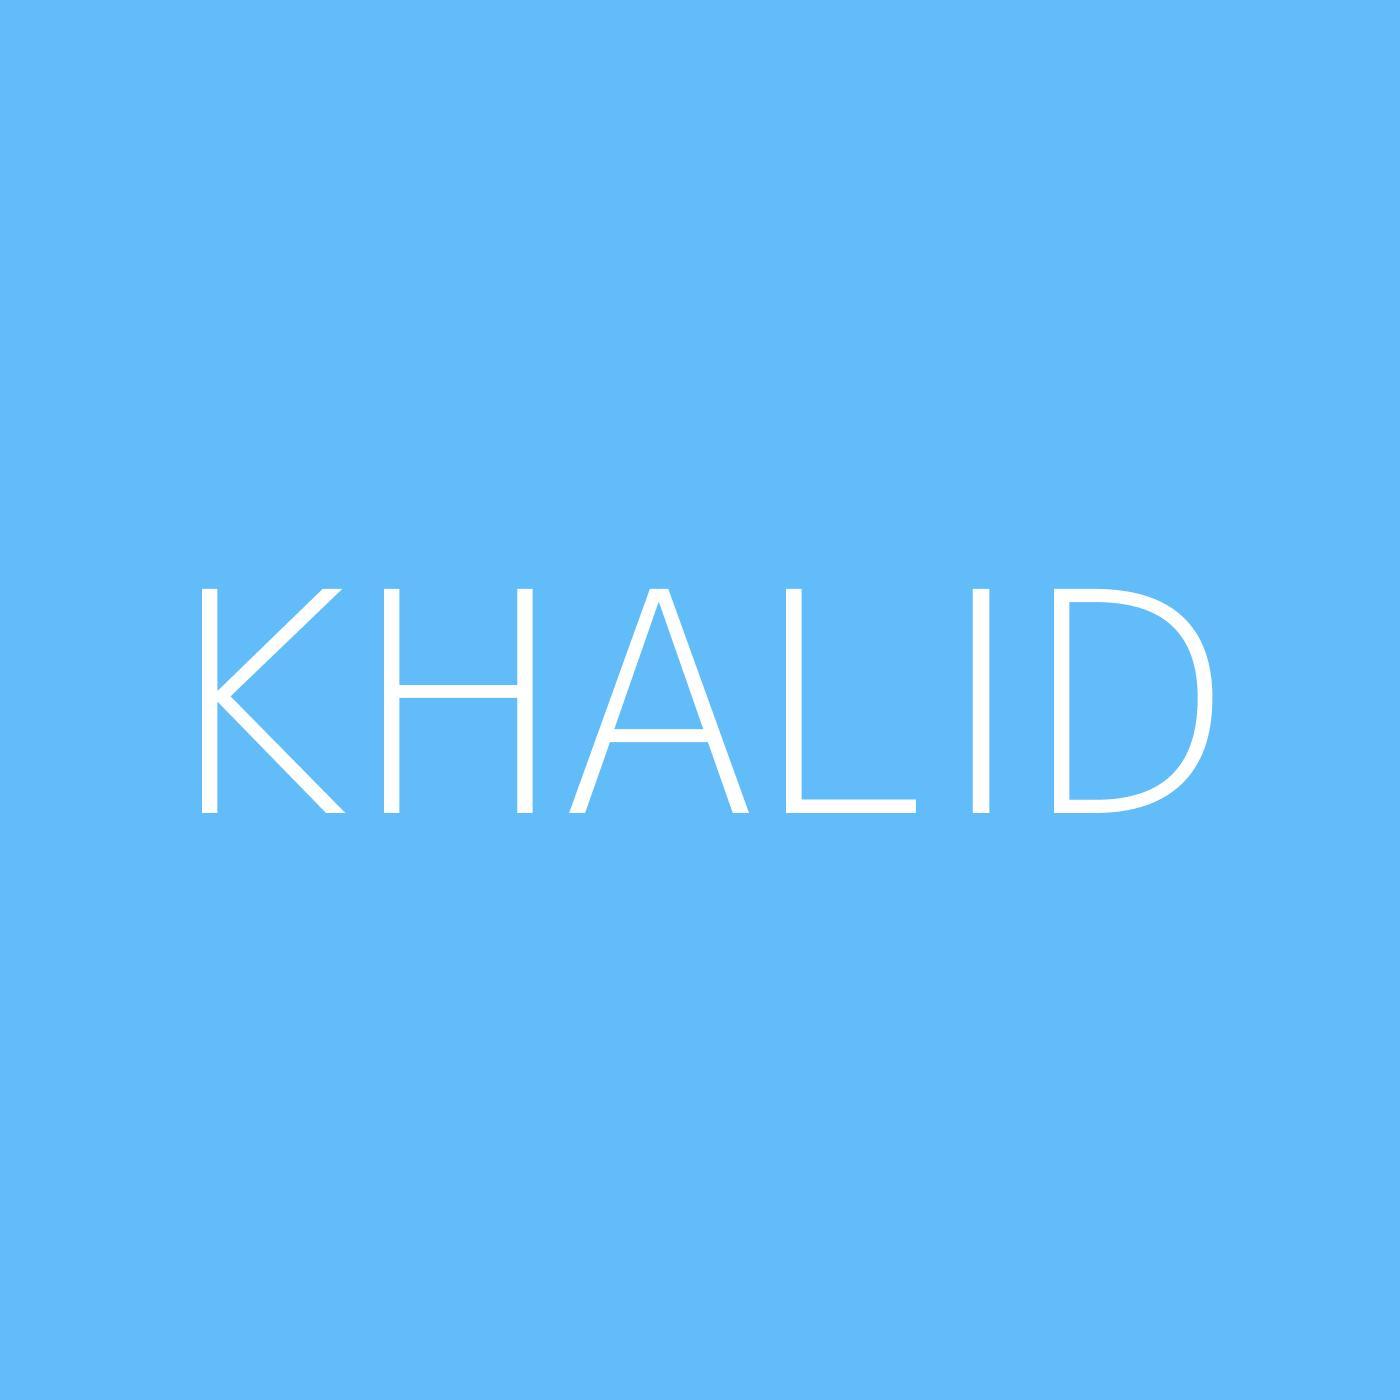 Khalid Playlist Artwork